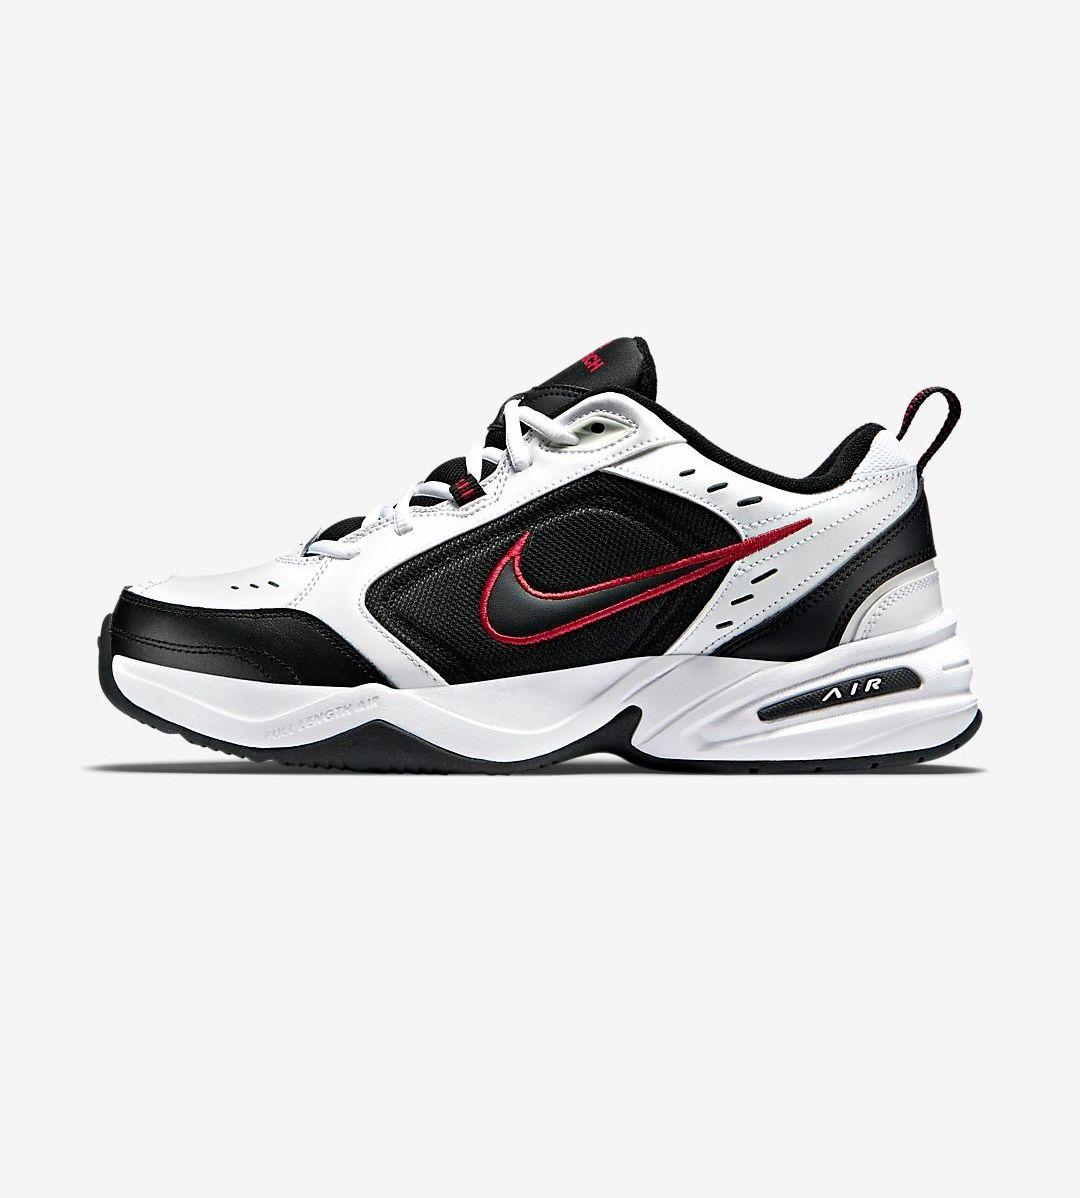 Chaussures Nike Air Monarch IV - Tailles 39 à 48.5